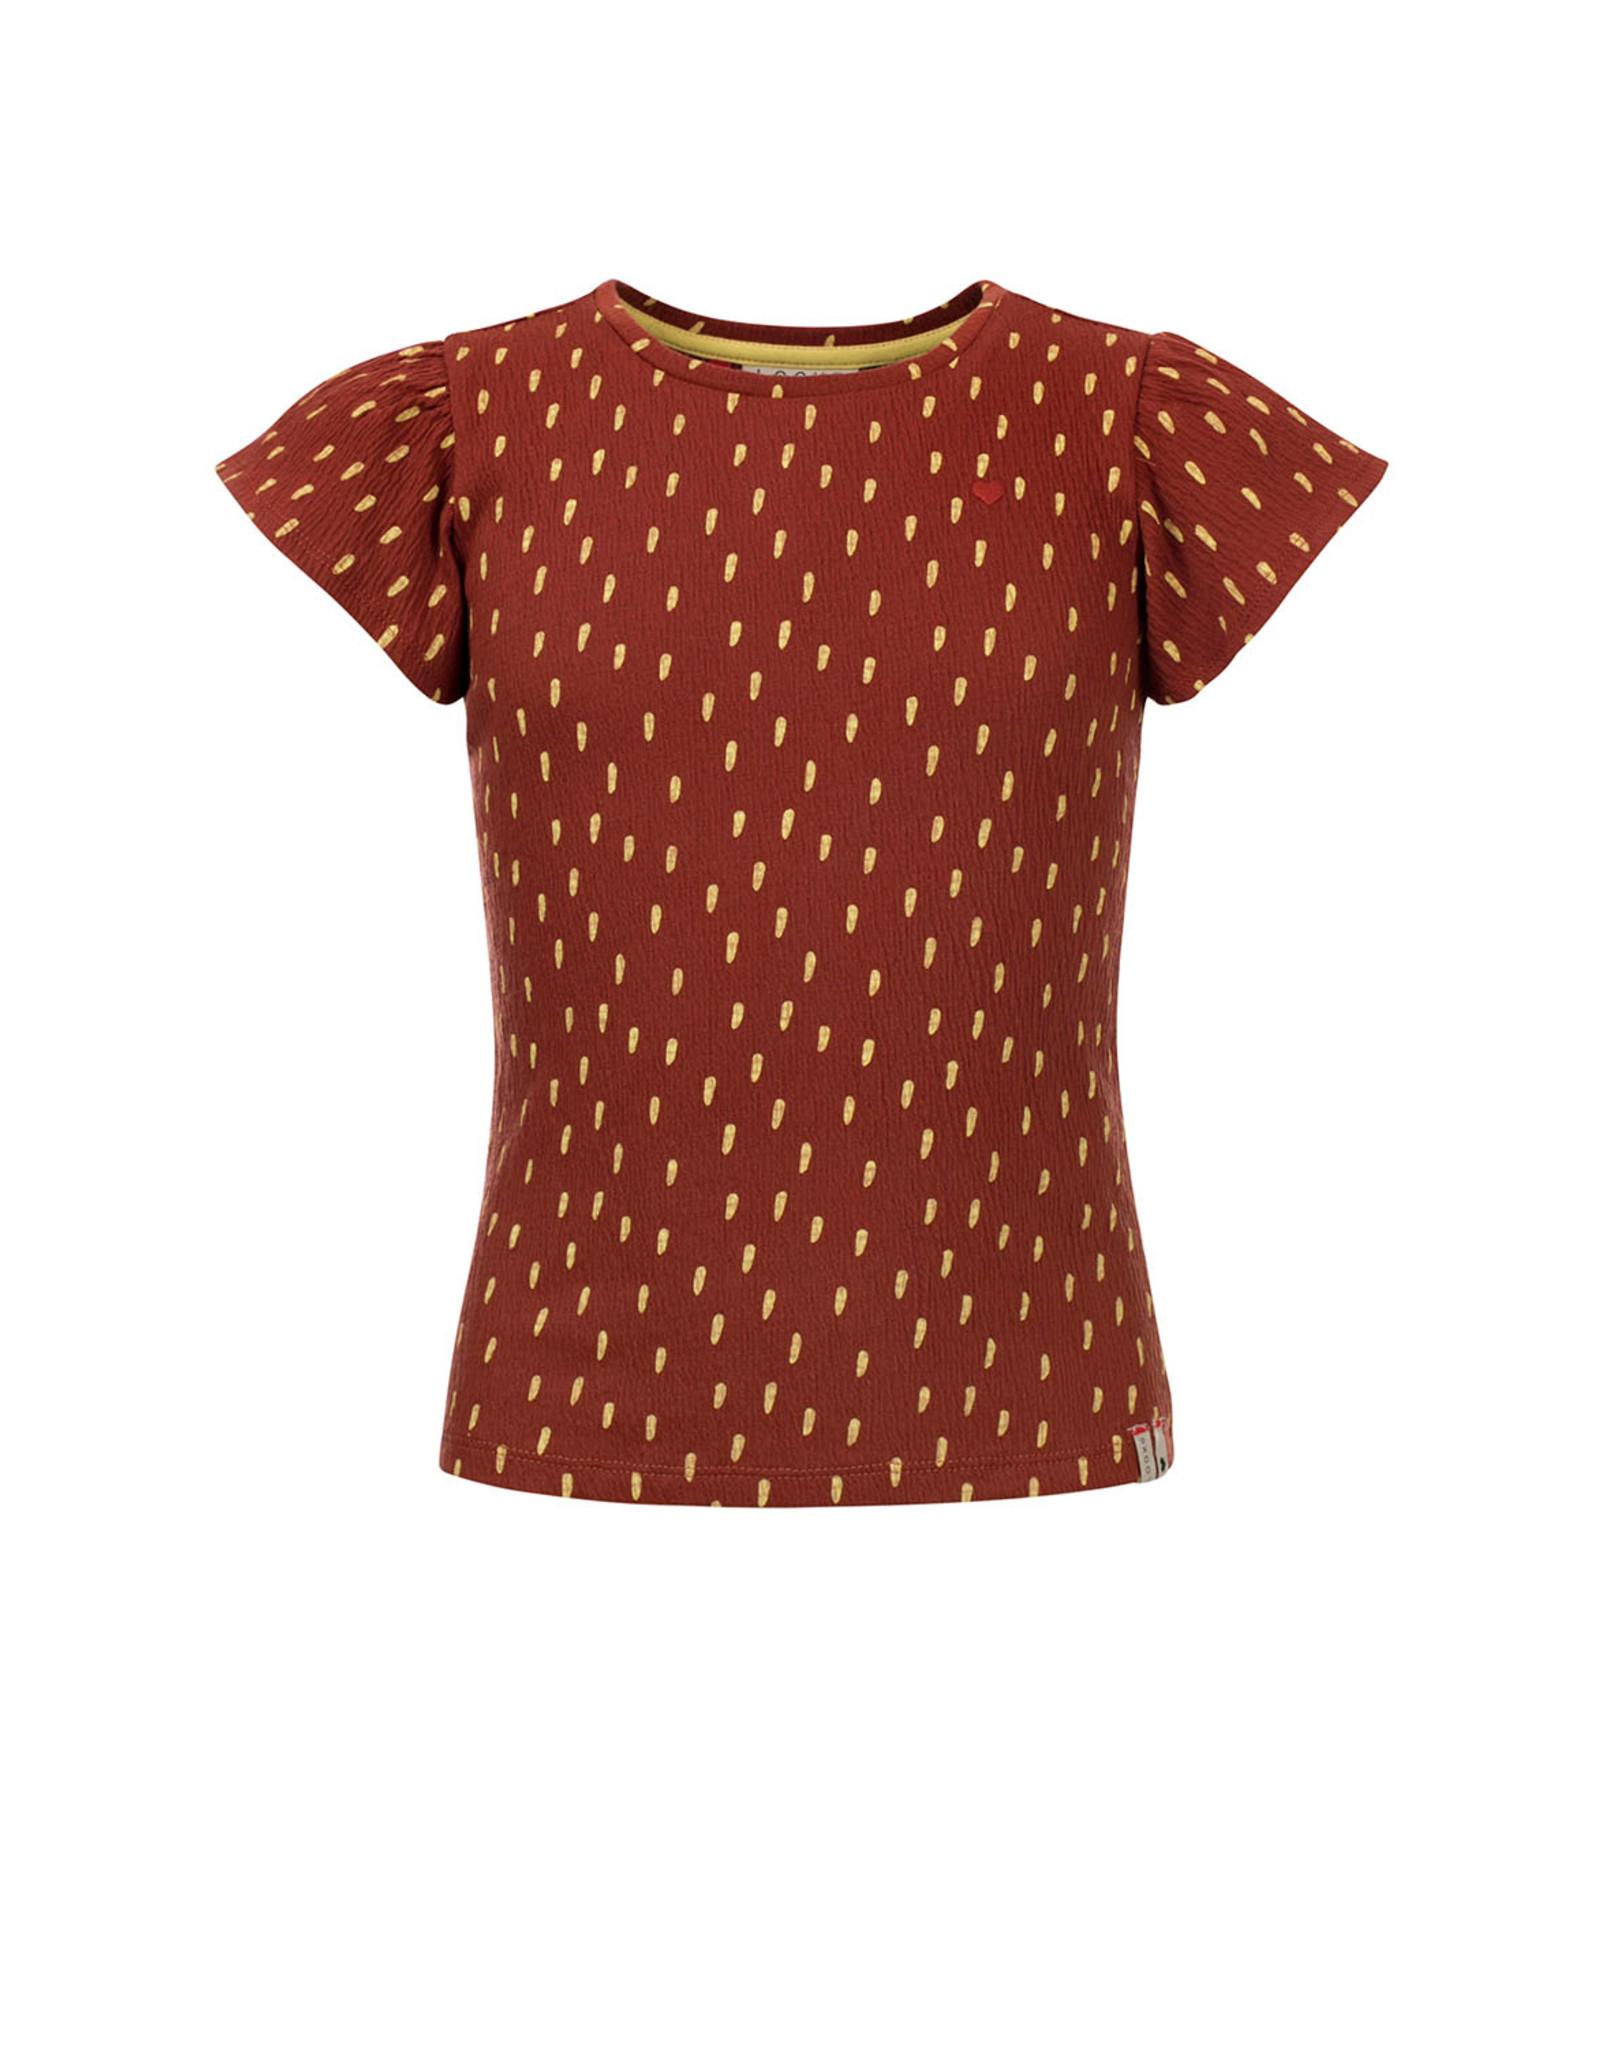 Looxs Little Little t-shirt doodle